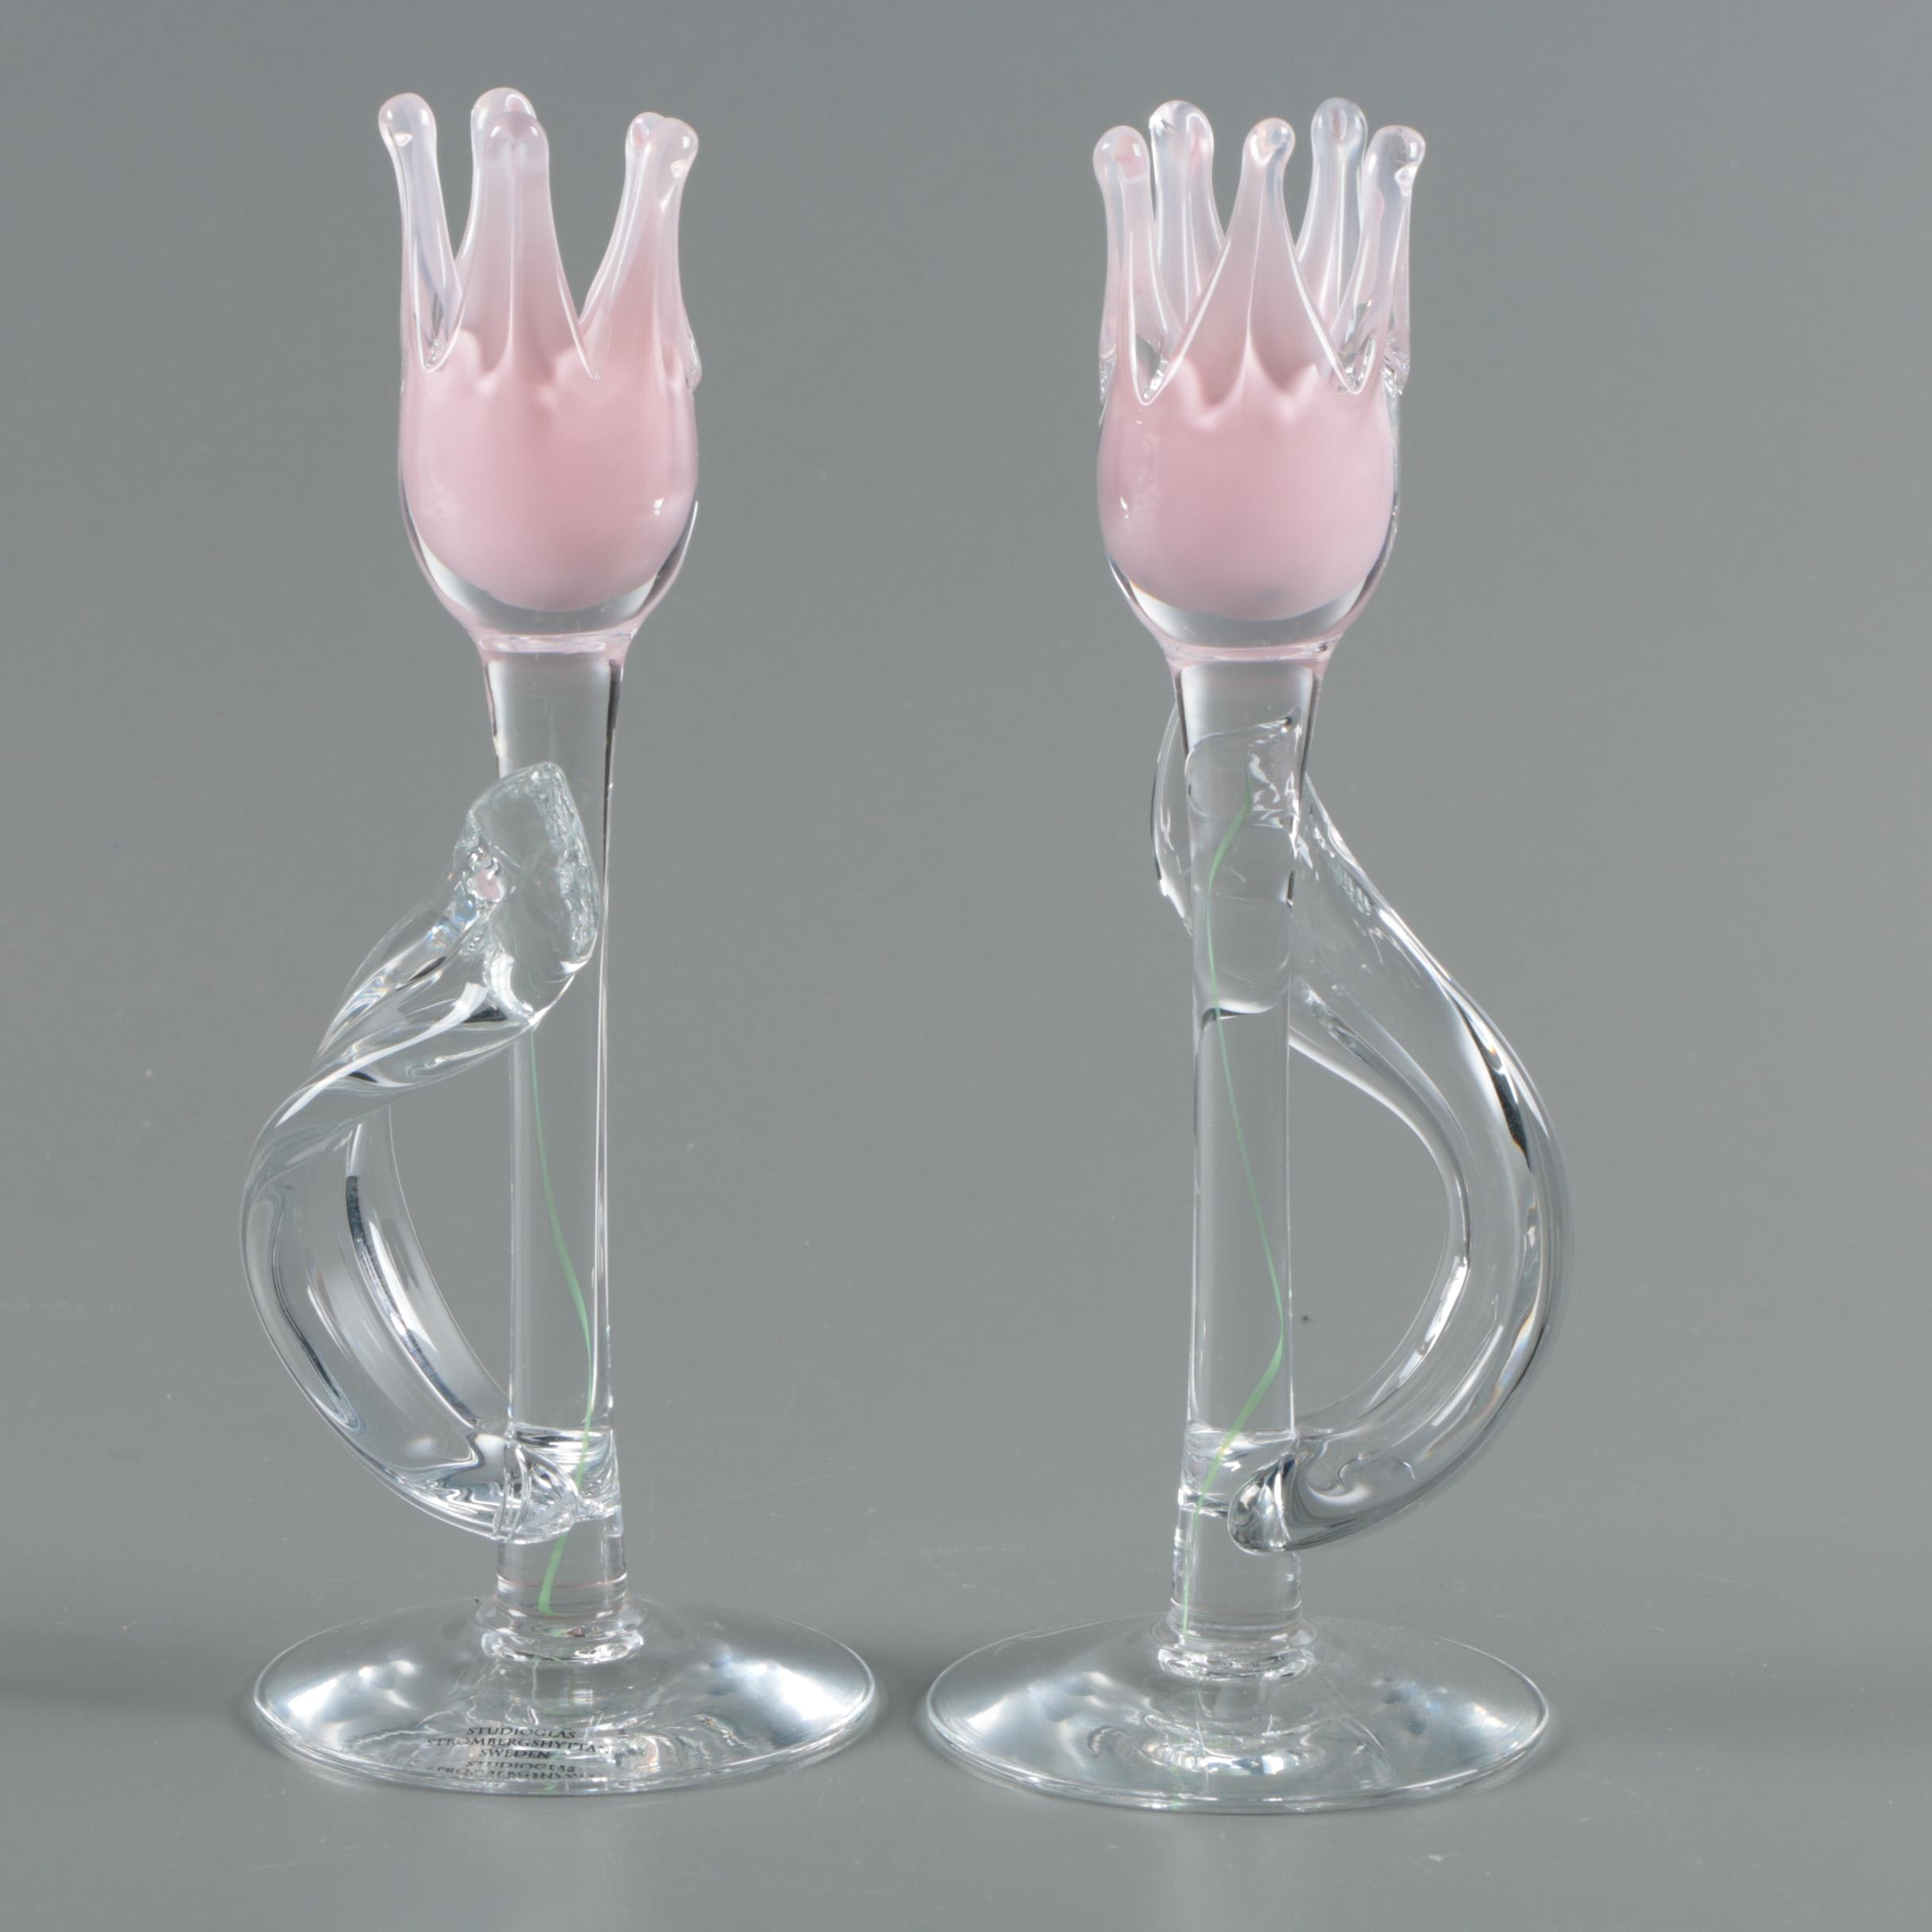 Studioglas Strömbergshyttan Swedish Crystal Tulip Candlestick Holders